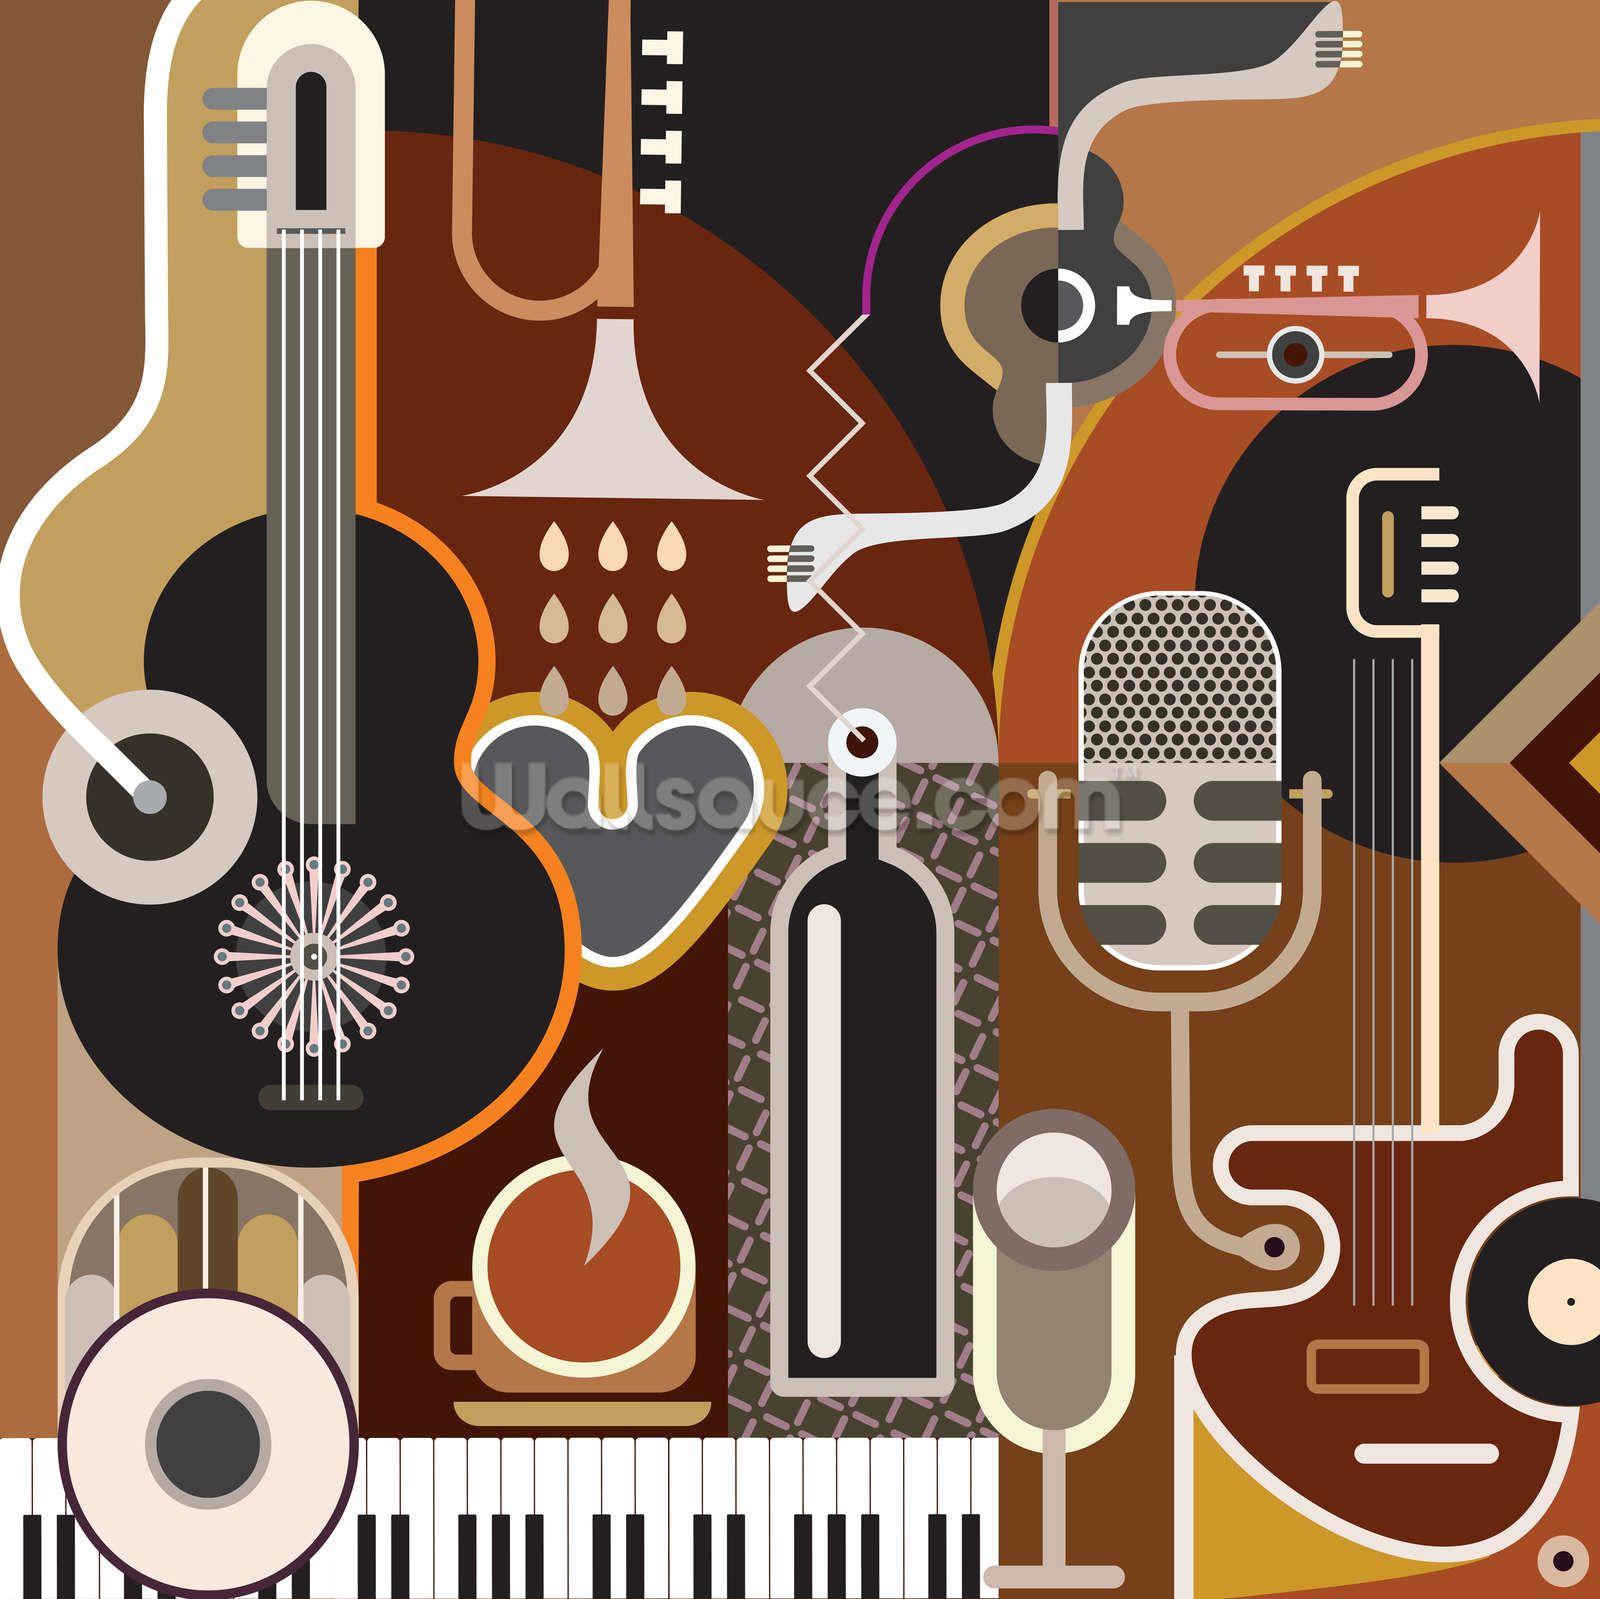 Music Abstract Wallpaper Wallsauce Uk Music Illustration Music Backgrounds Musical Art